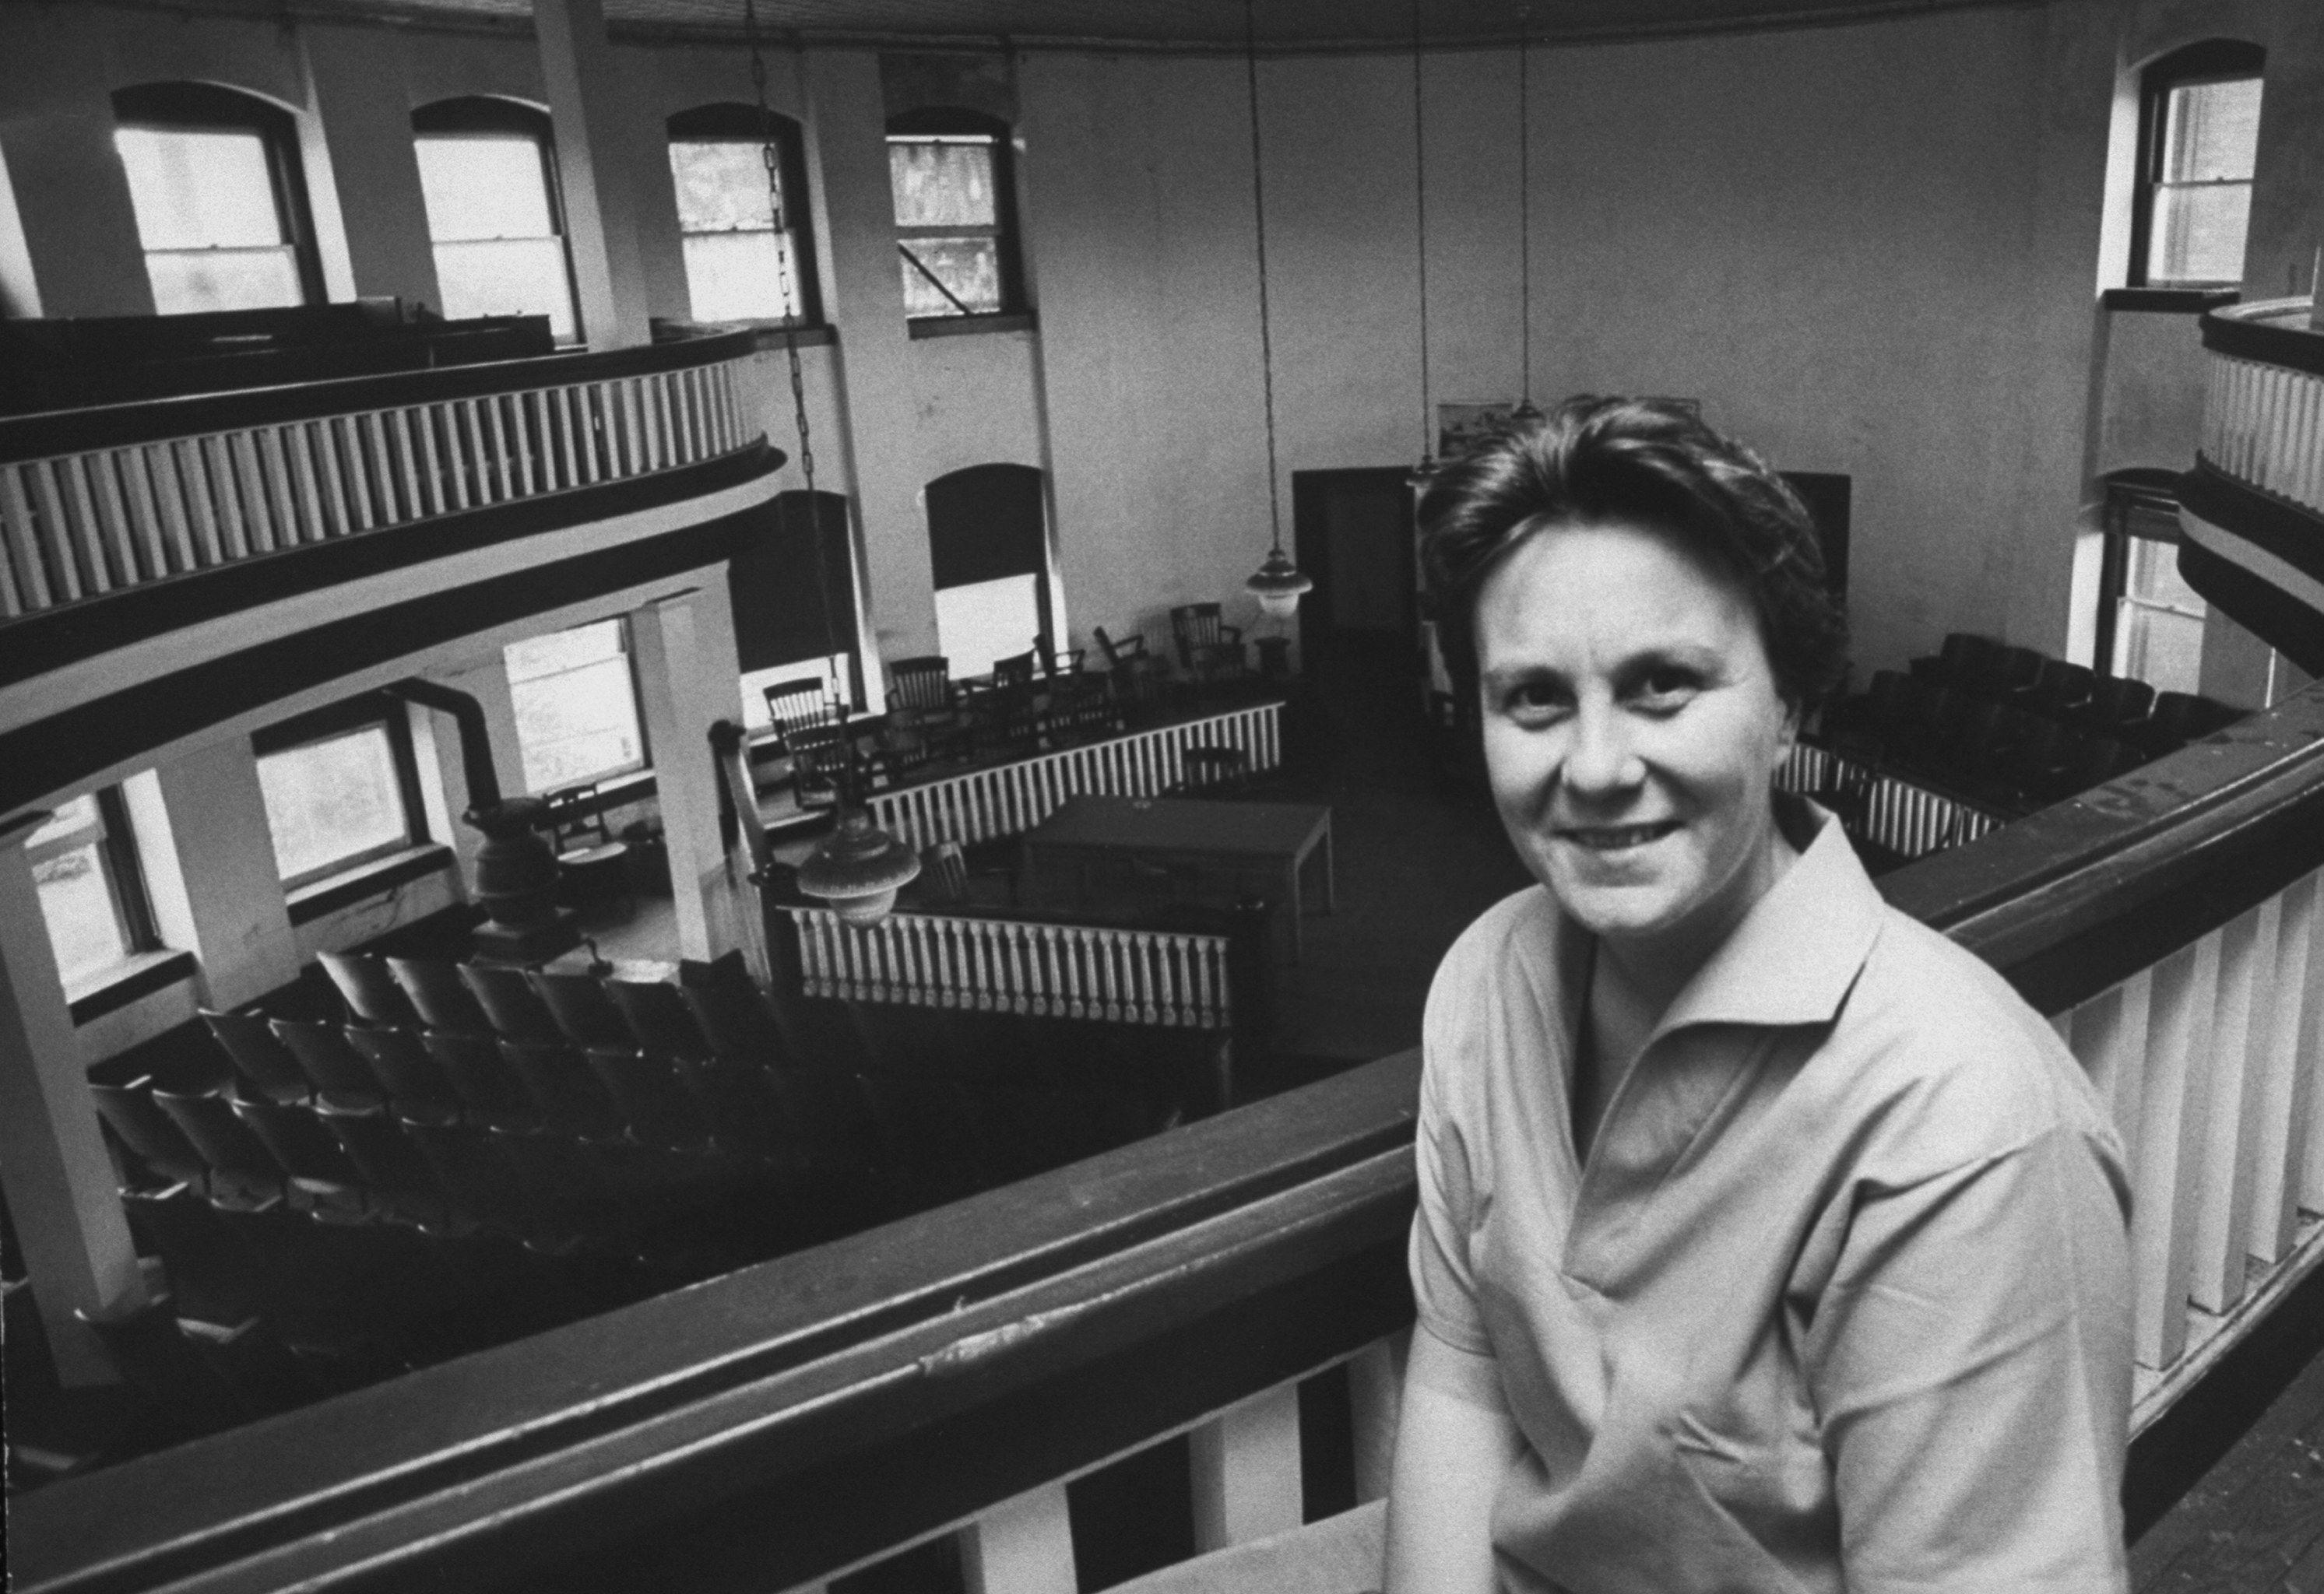 Harper Lee, Author of 'To Kill a Mockingbird'